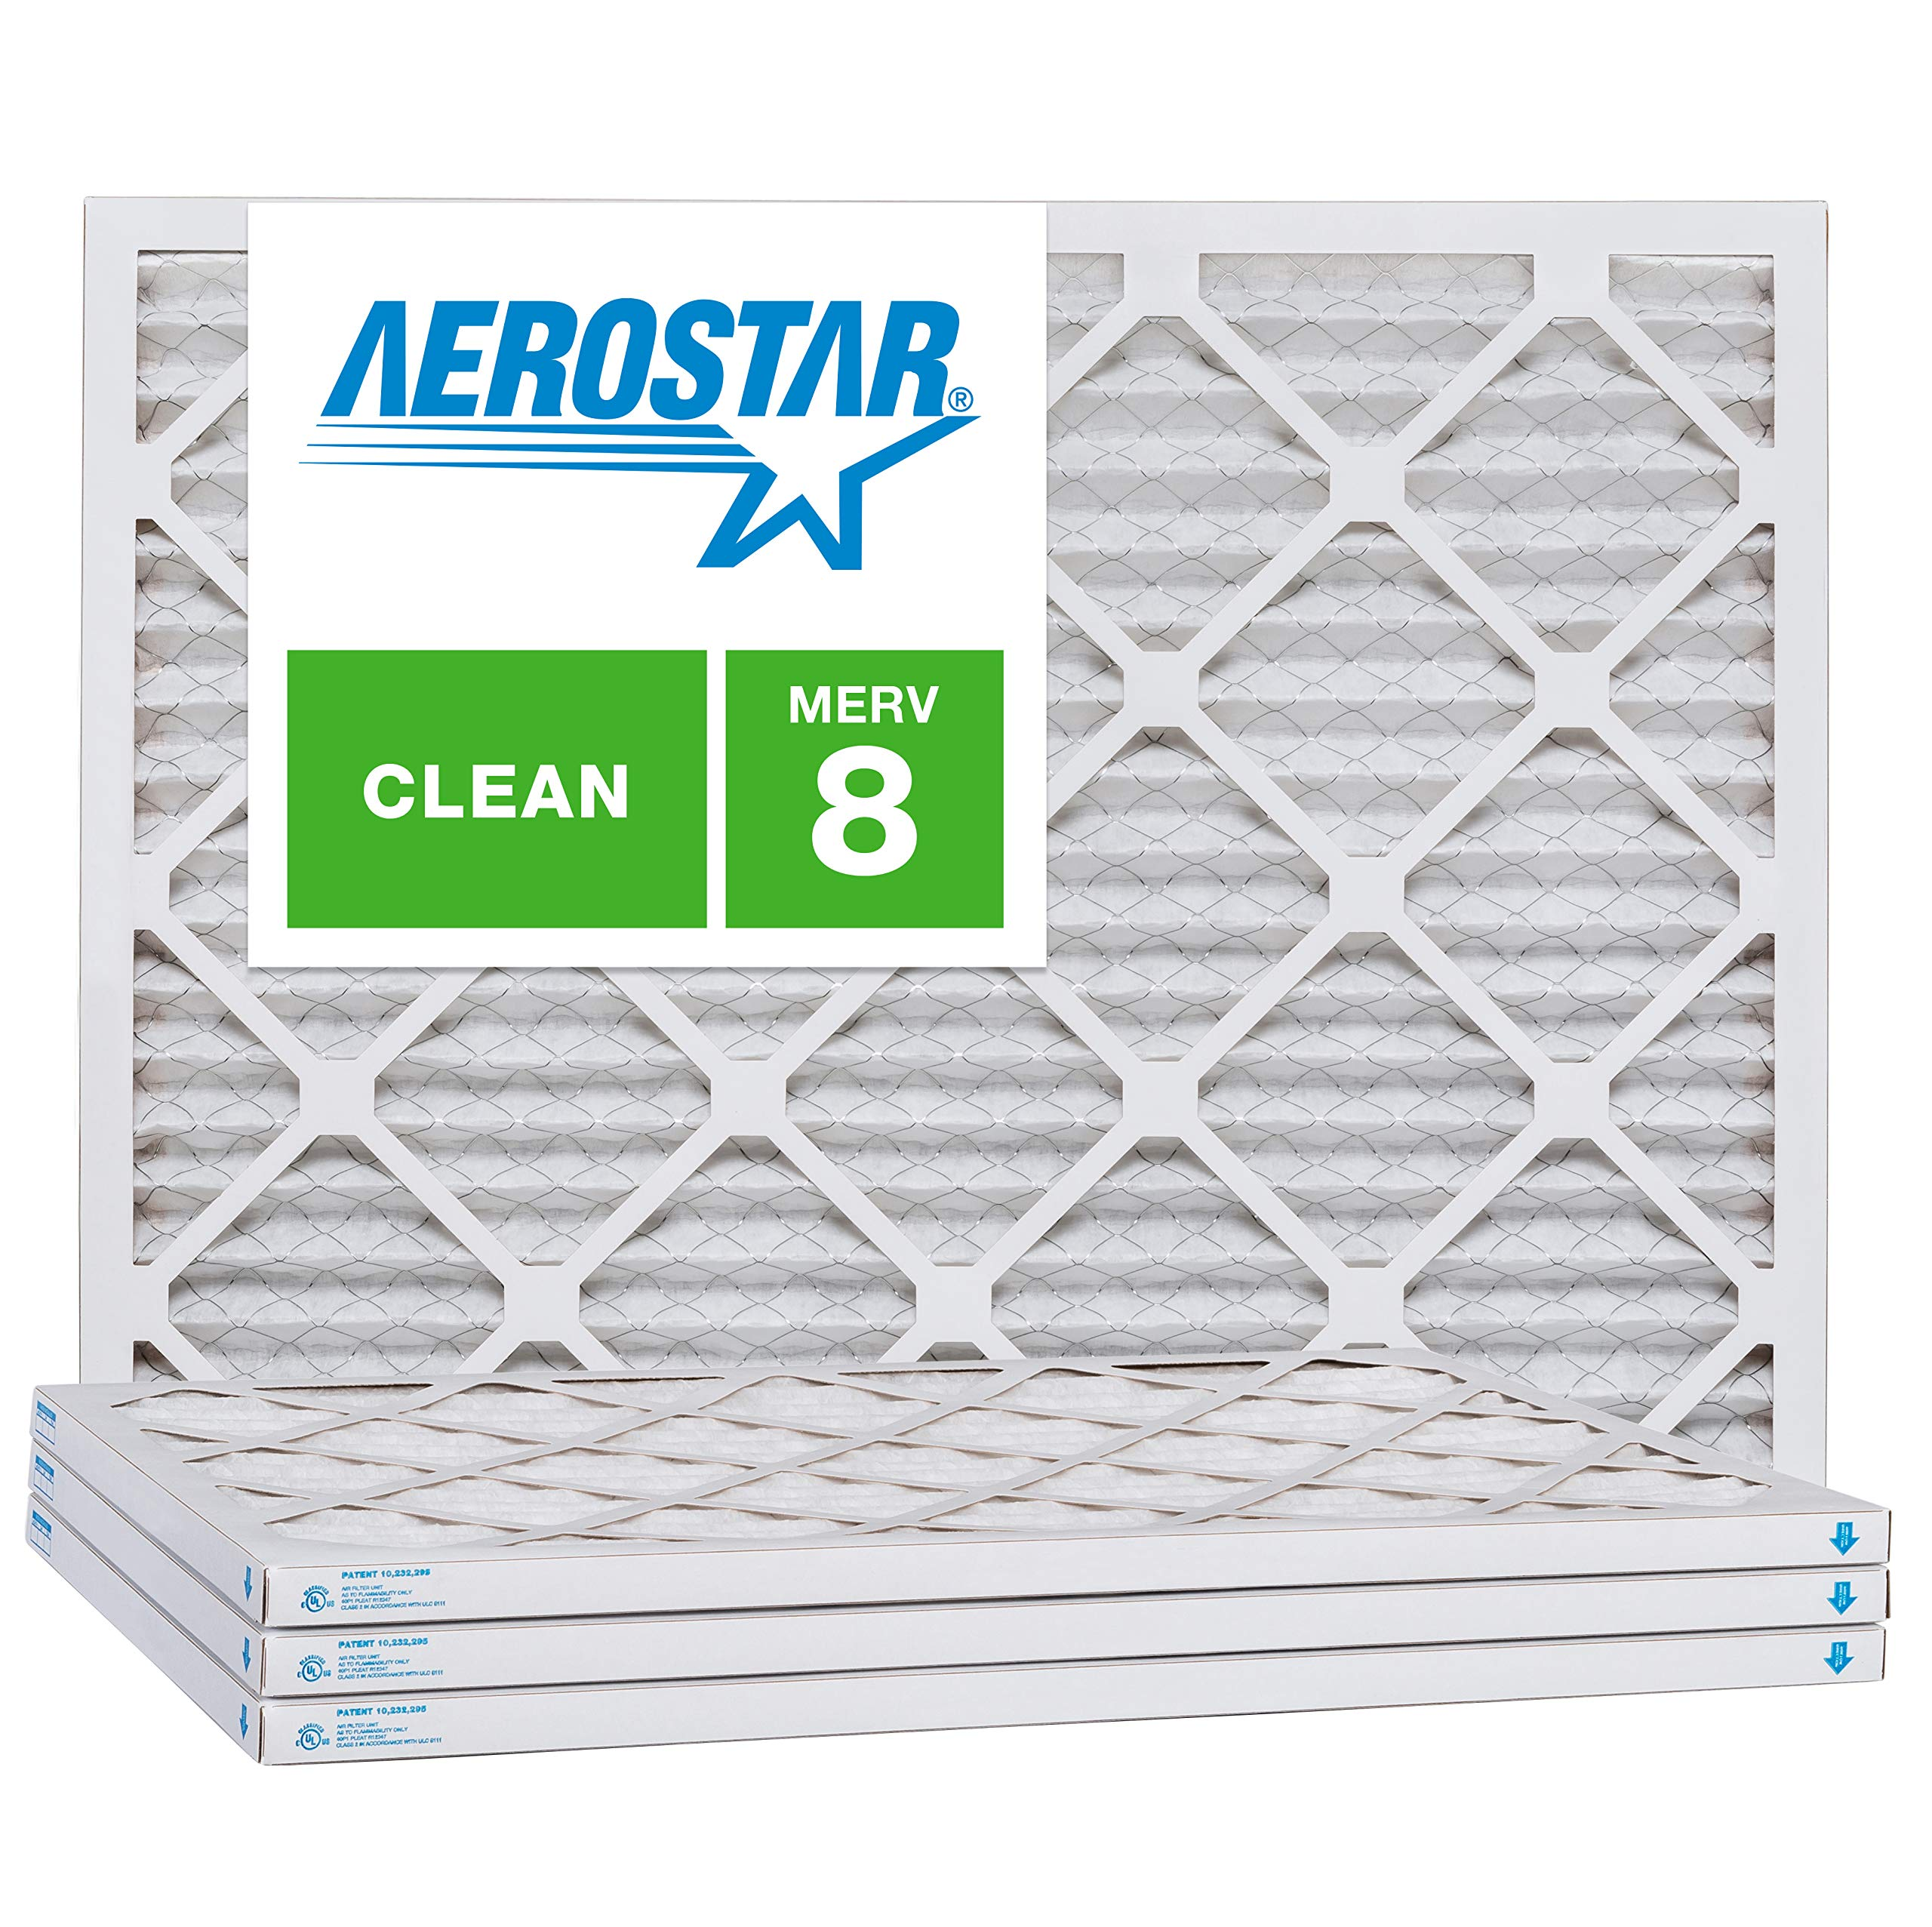 Aerostar 6x10x1 MERV 8, Pleated Air Filter, 6x10x1, Box of 4, Made in The USA